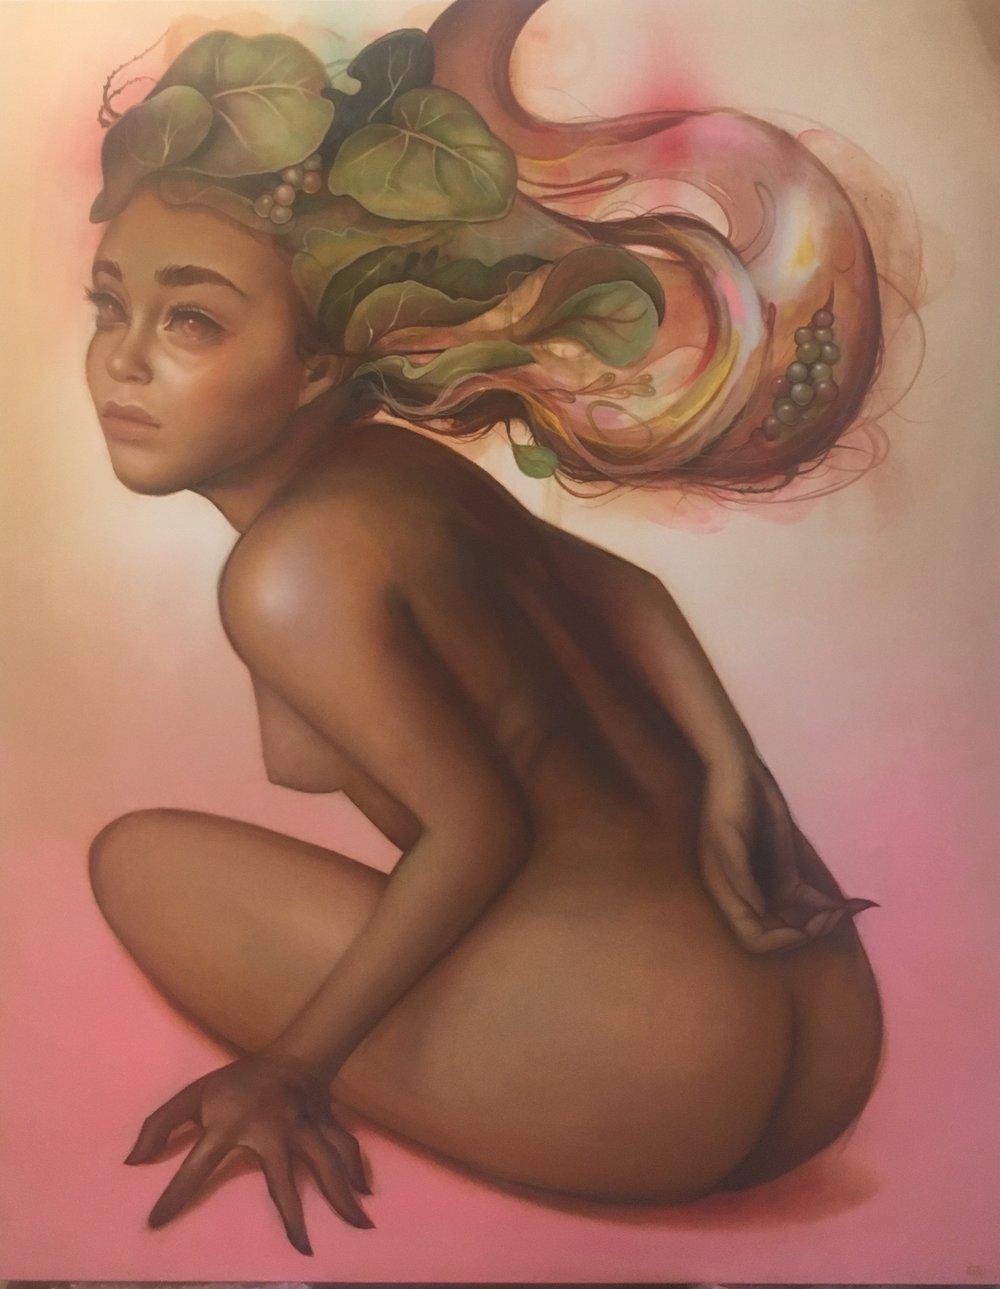 TATI SUAREZ  Uvifera , 2016  Oil and aerosol on canvas. Signed lower right  60 x 48 in.